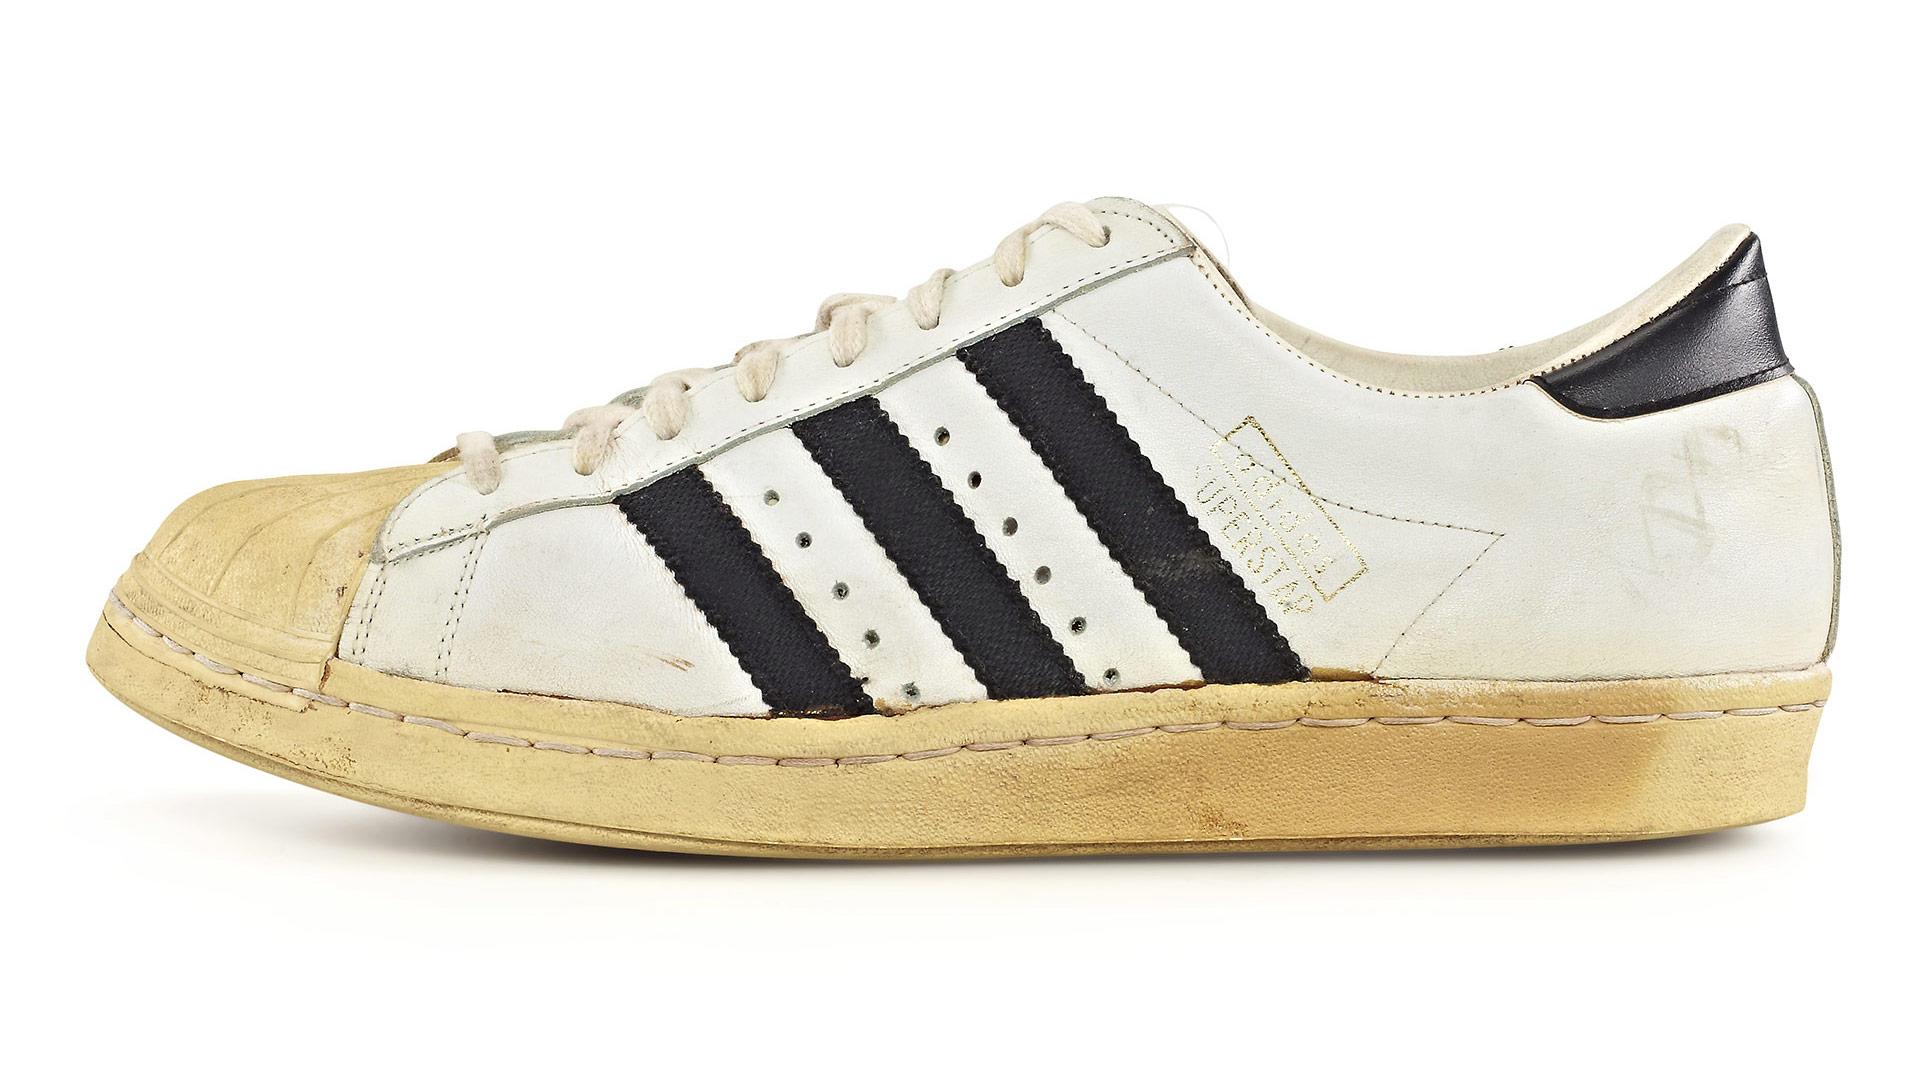 Adidas Superstar z roku 1970. © Adidas